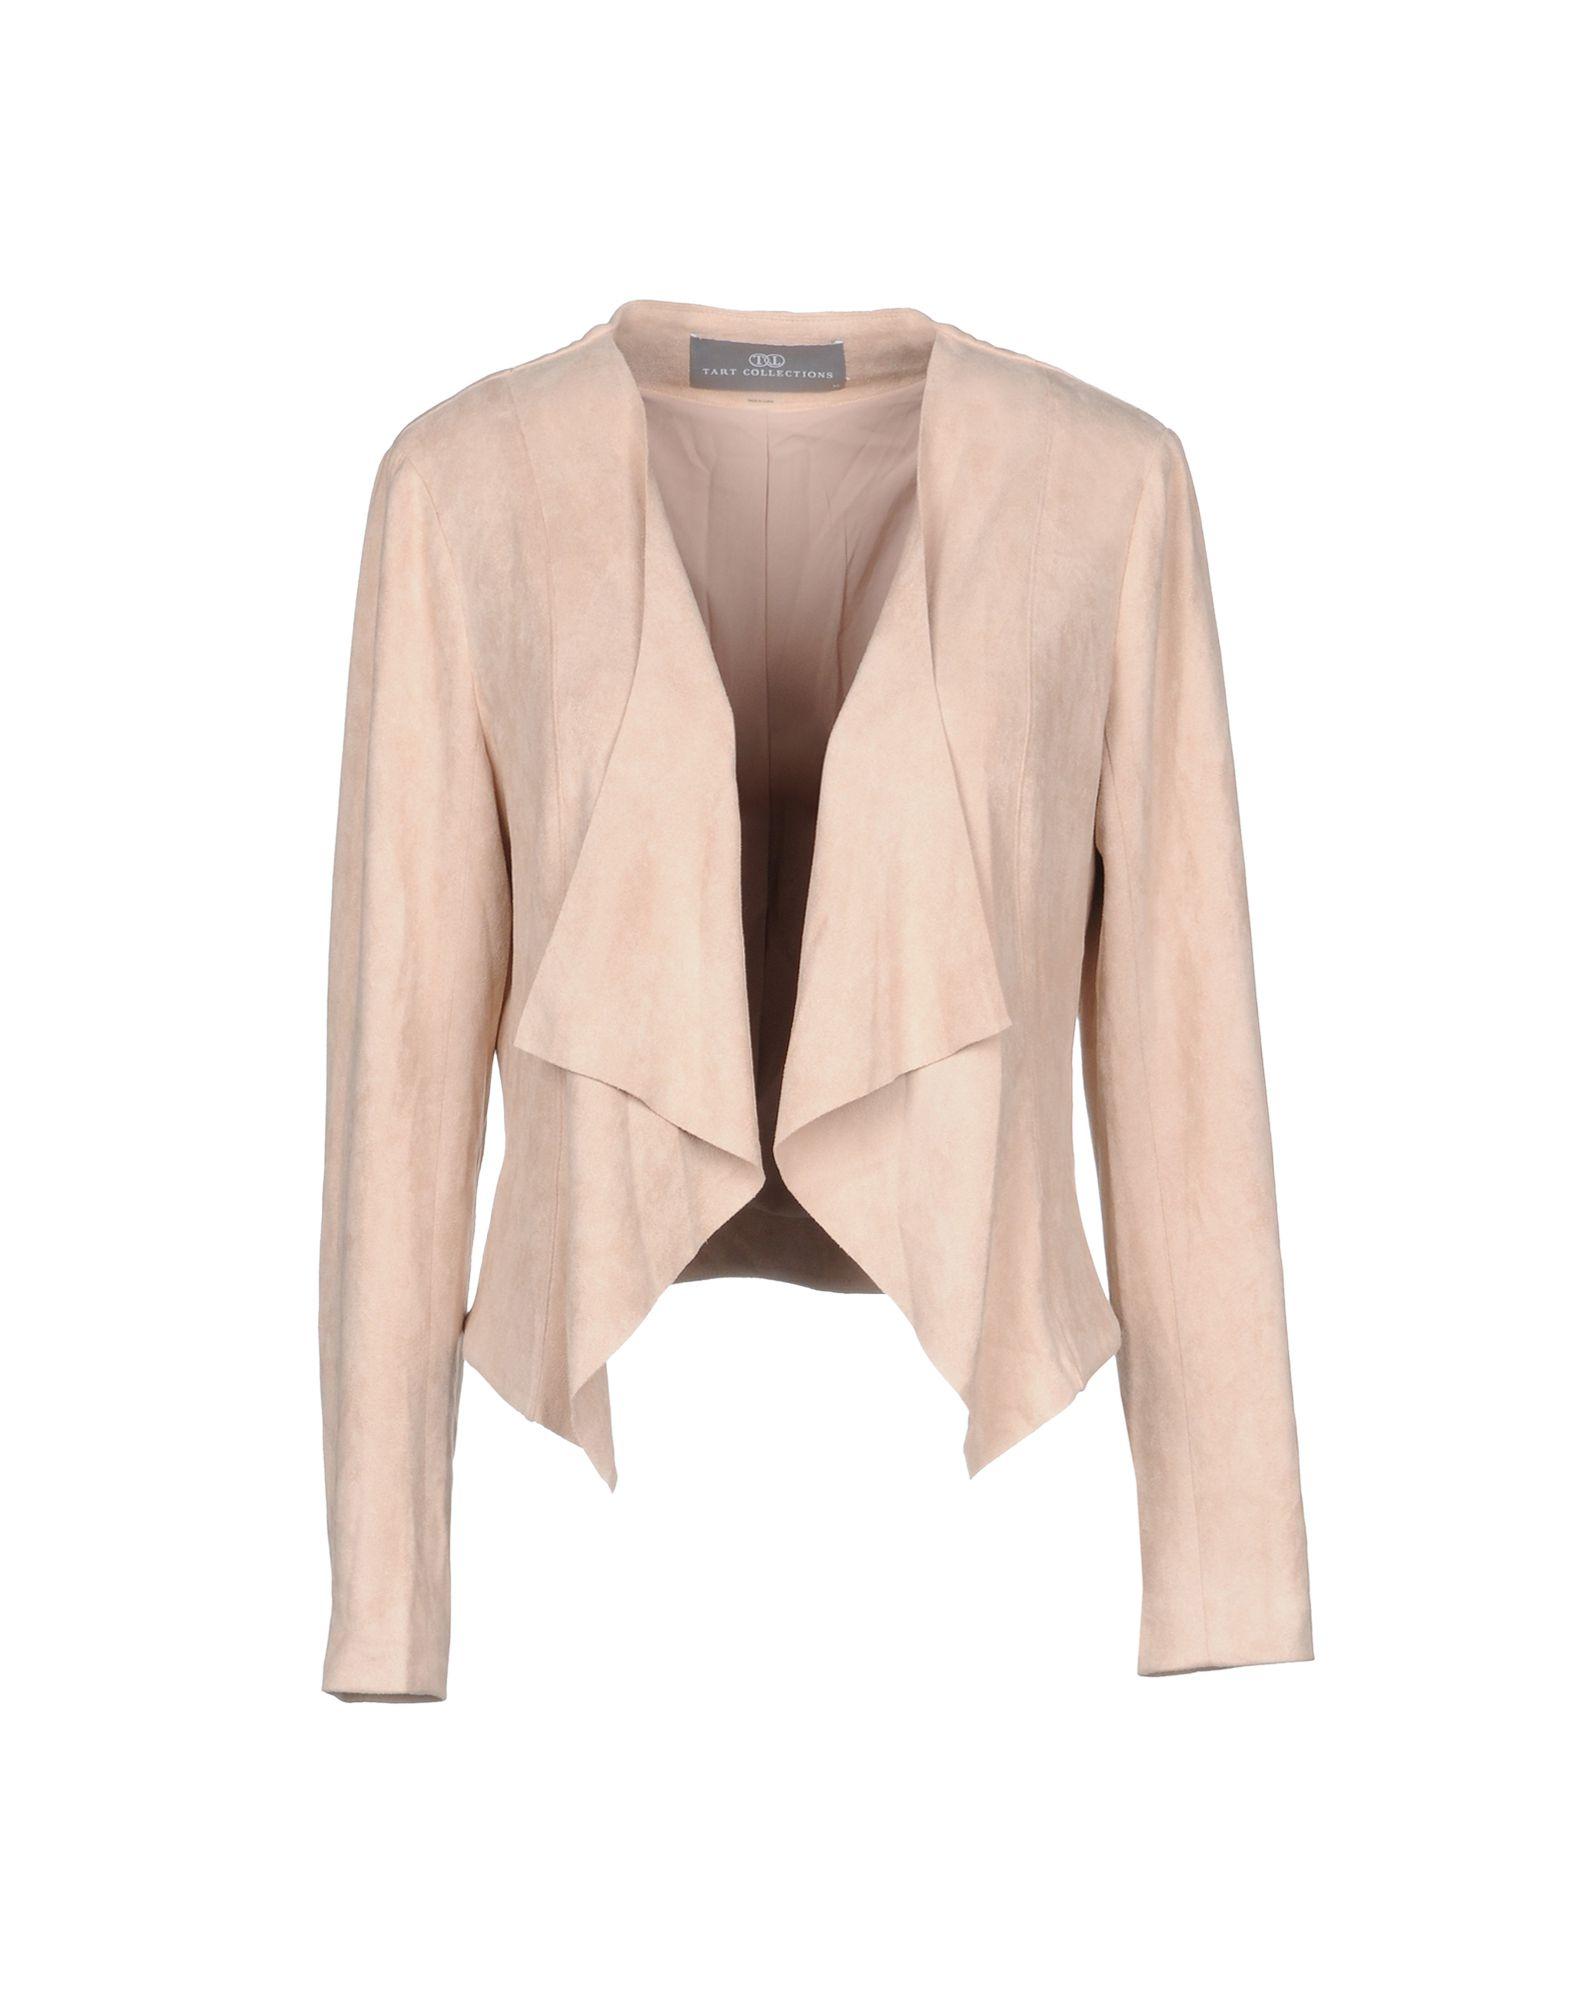 TART COLLECTIONS Blazer in Pastel Pink